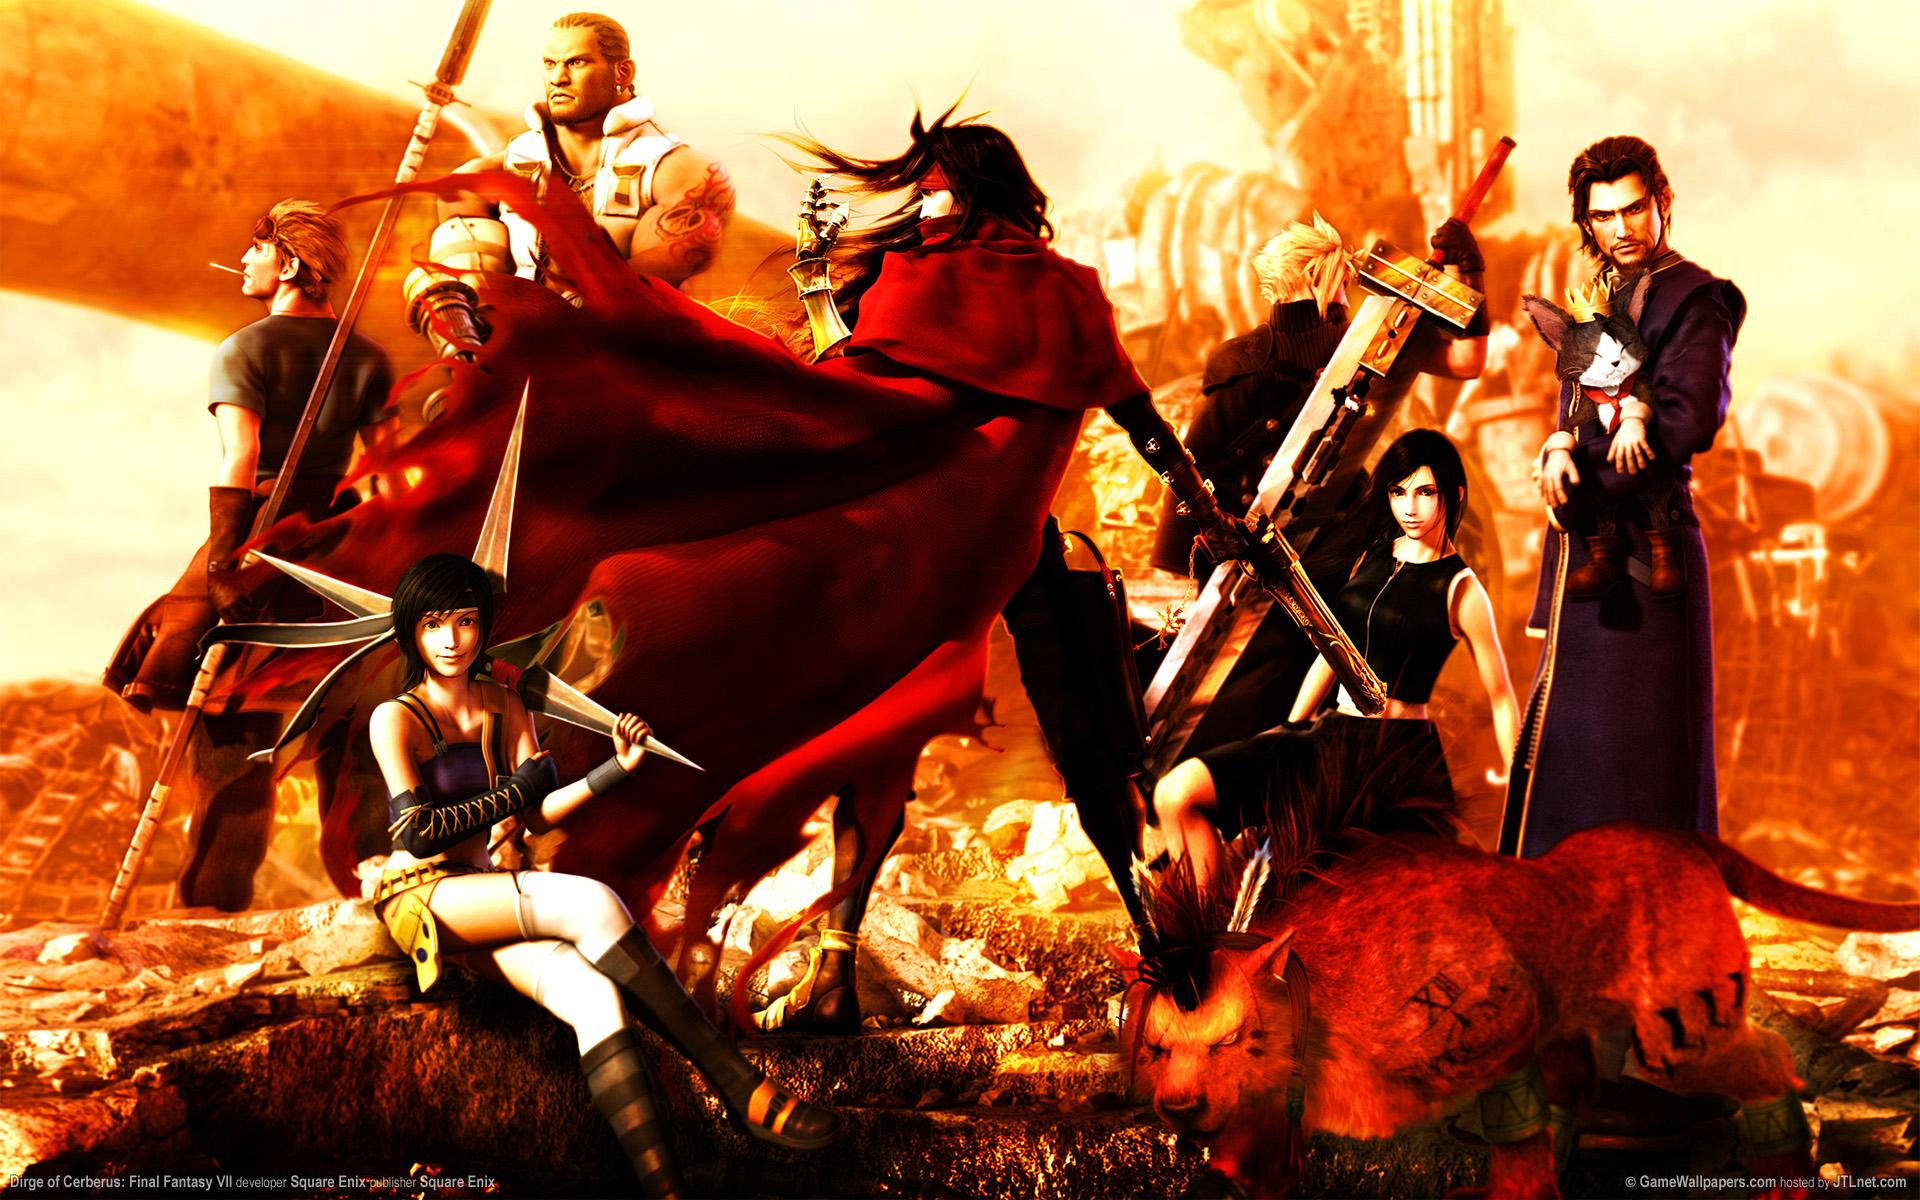 GHoF Final Fantasy 7 vs Crash Bandicoot 2 Our Humble Opinions 1920x1200